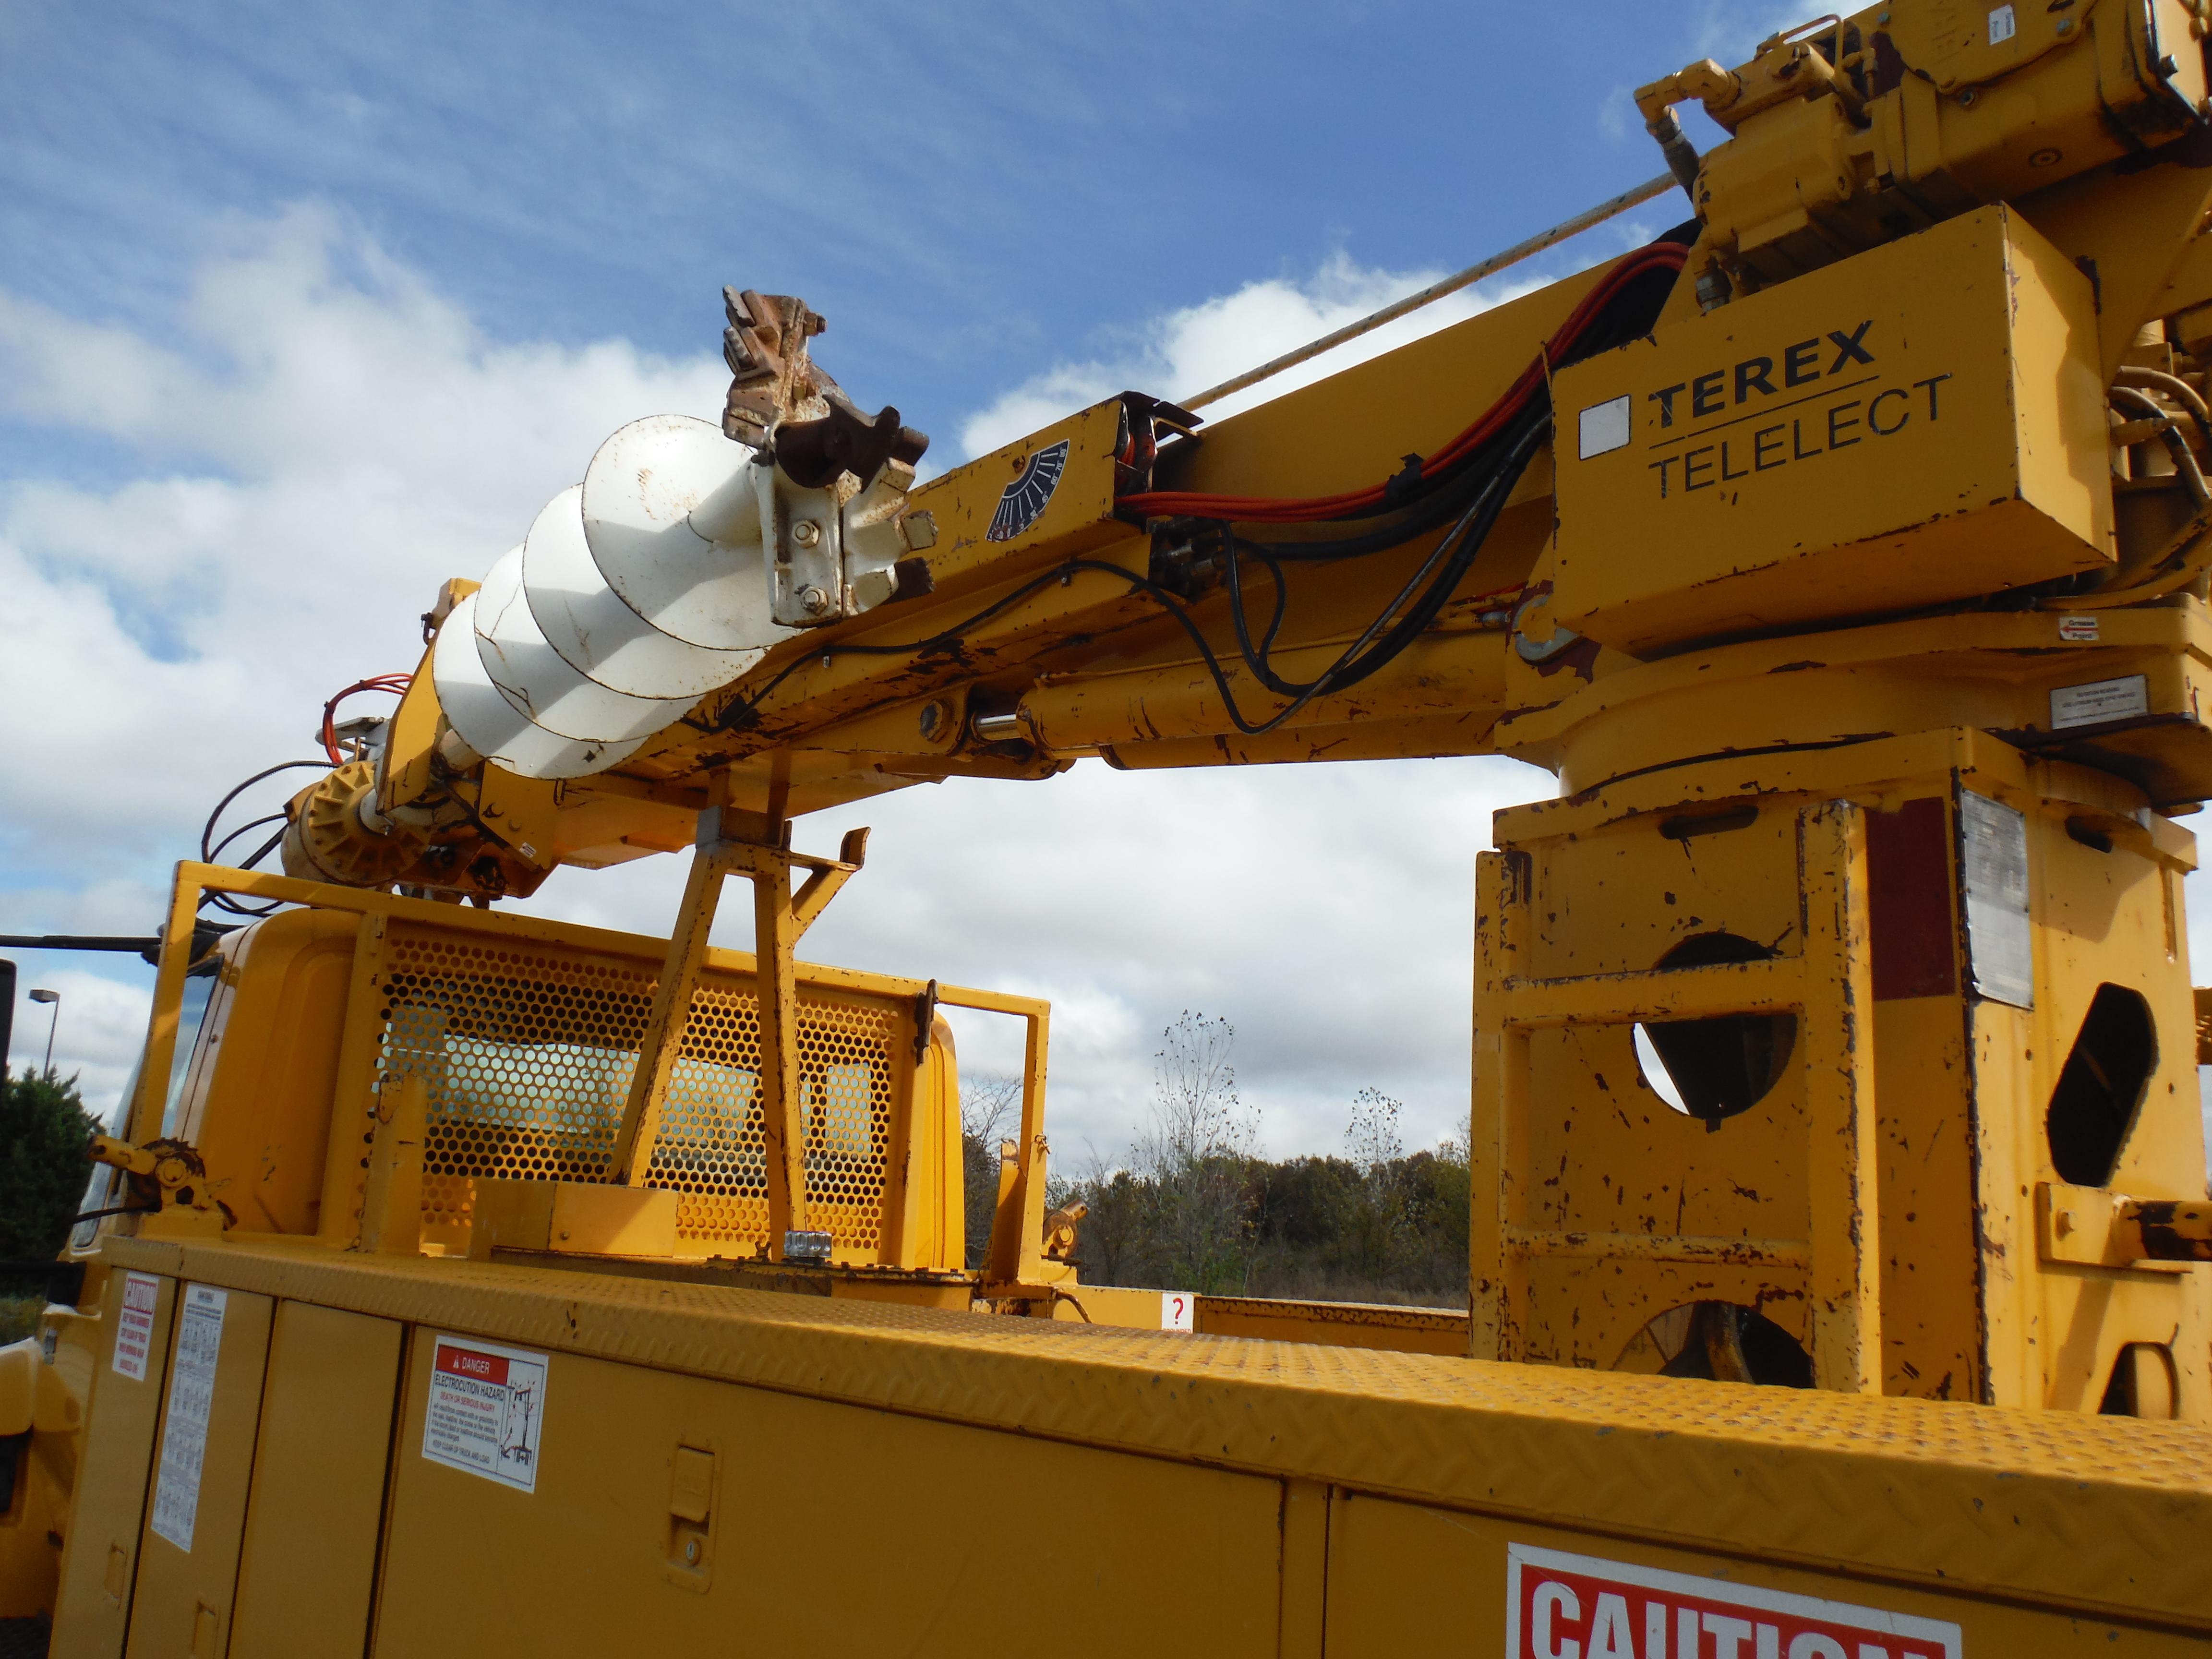 Work-Ready Trucks | Utility Equipment Service, Inc